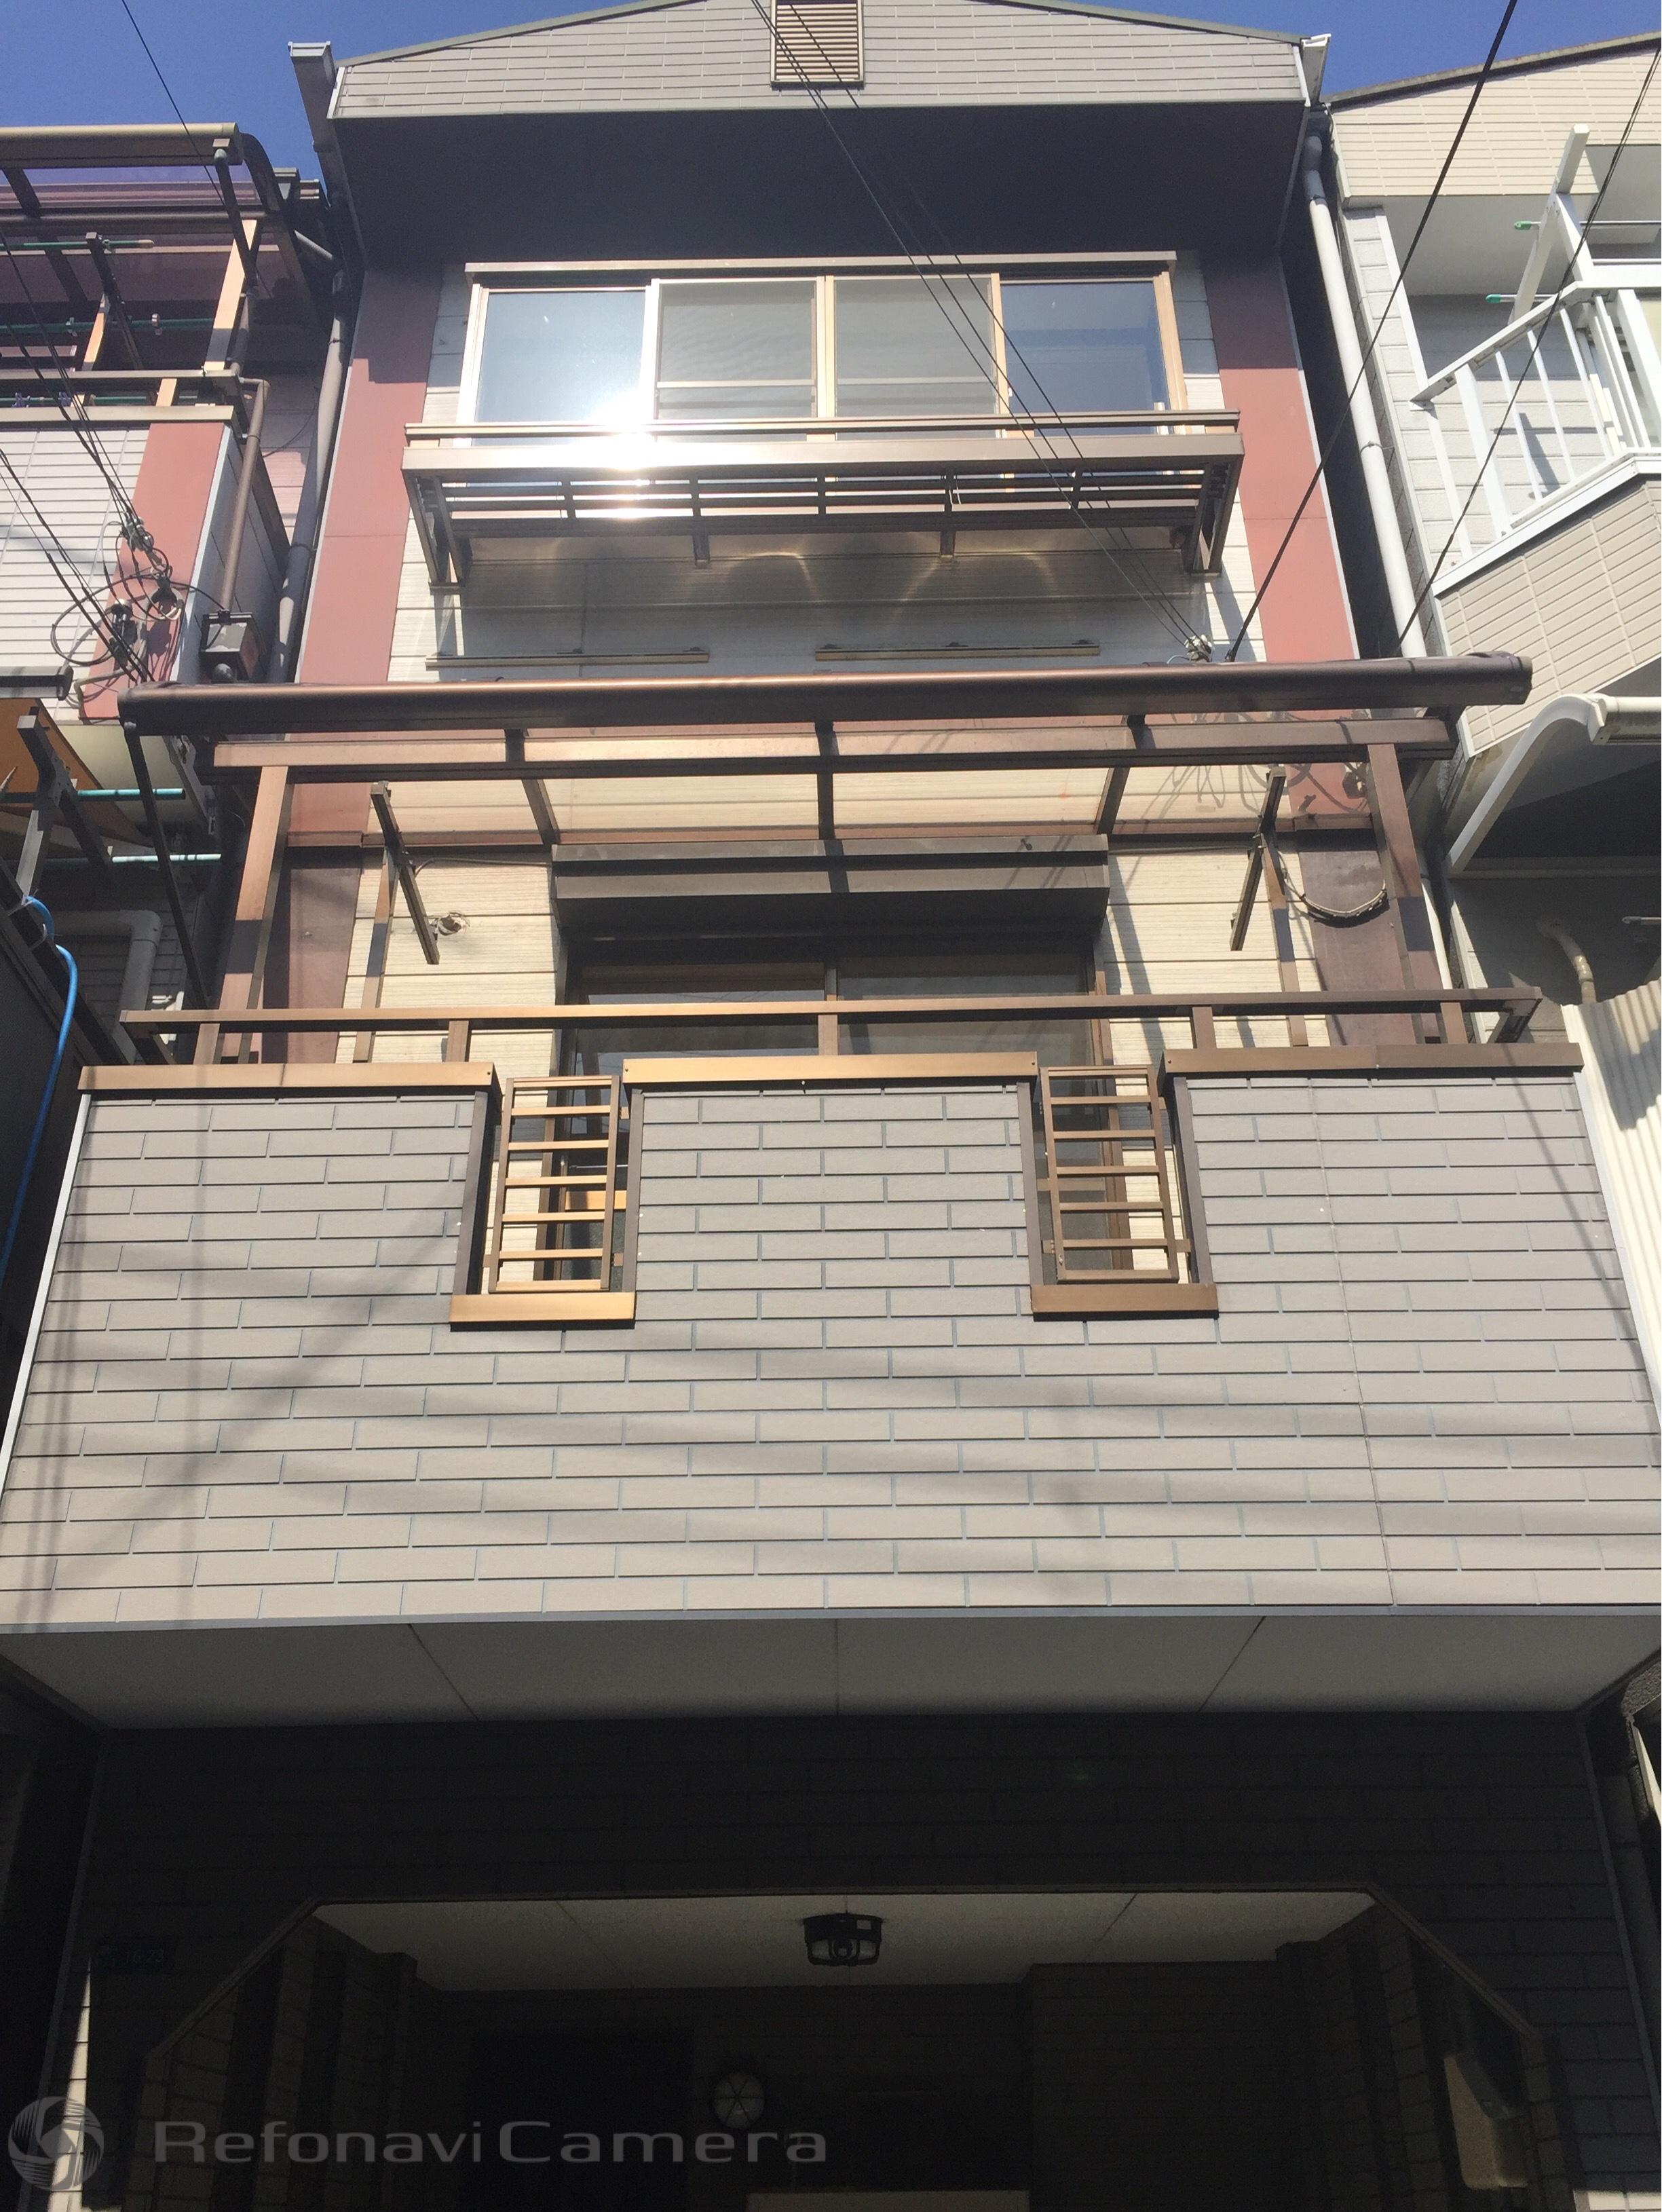 大阪市東住吉区 内装リフォーム工事